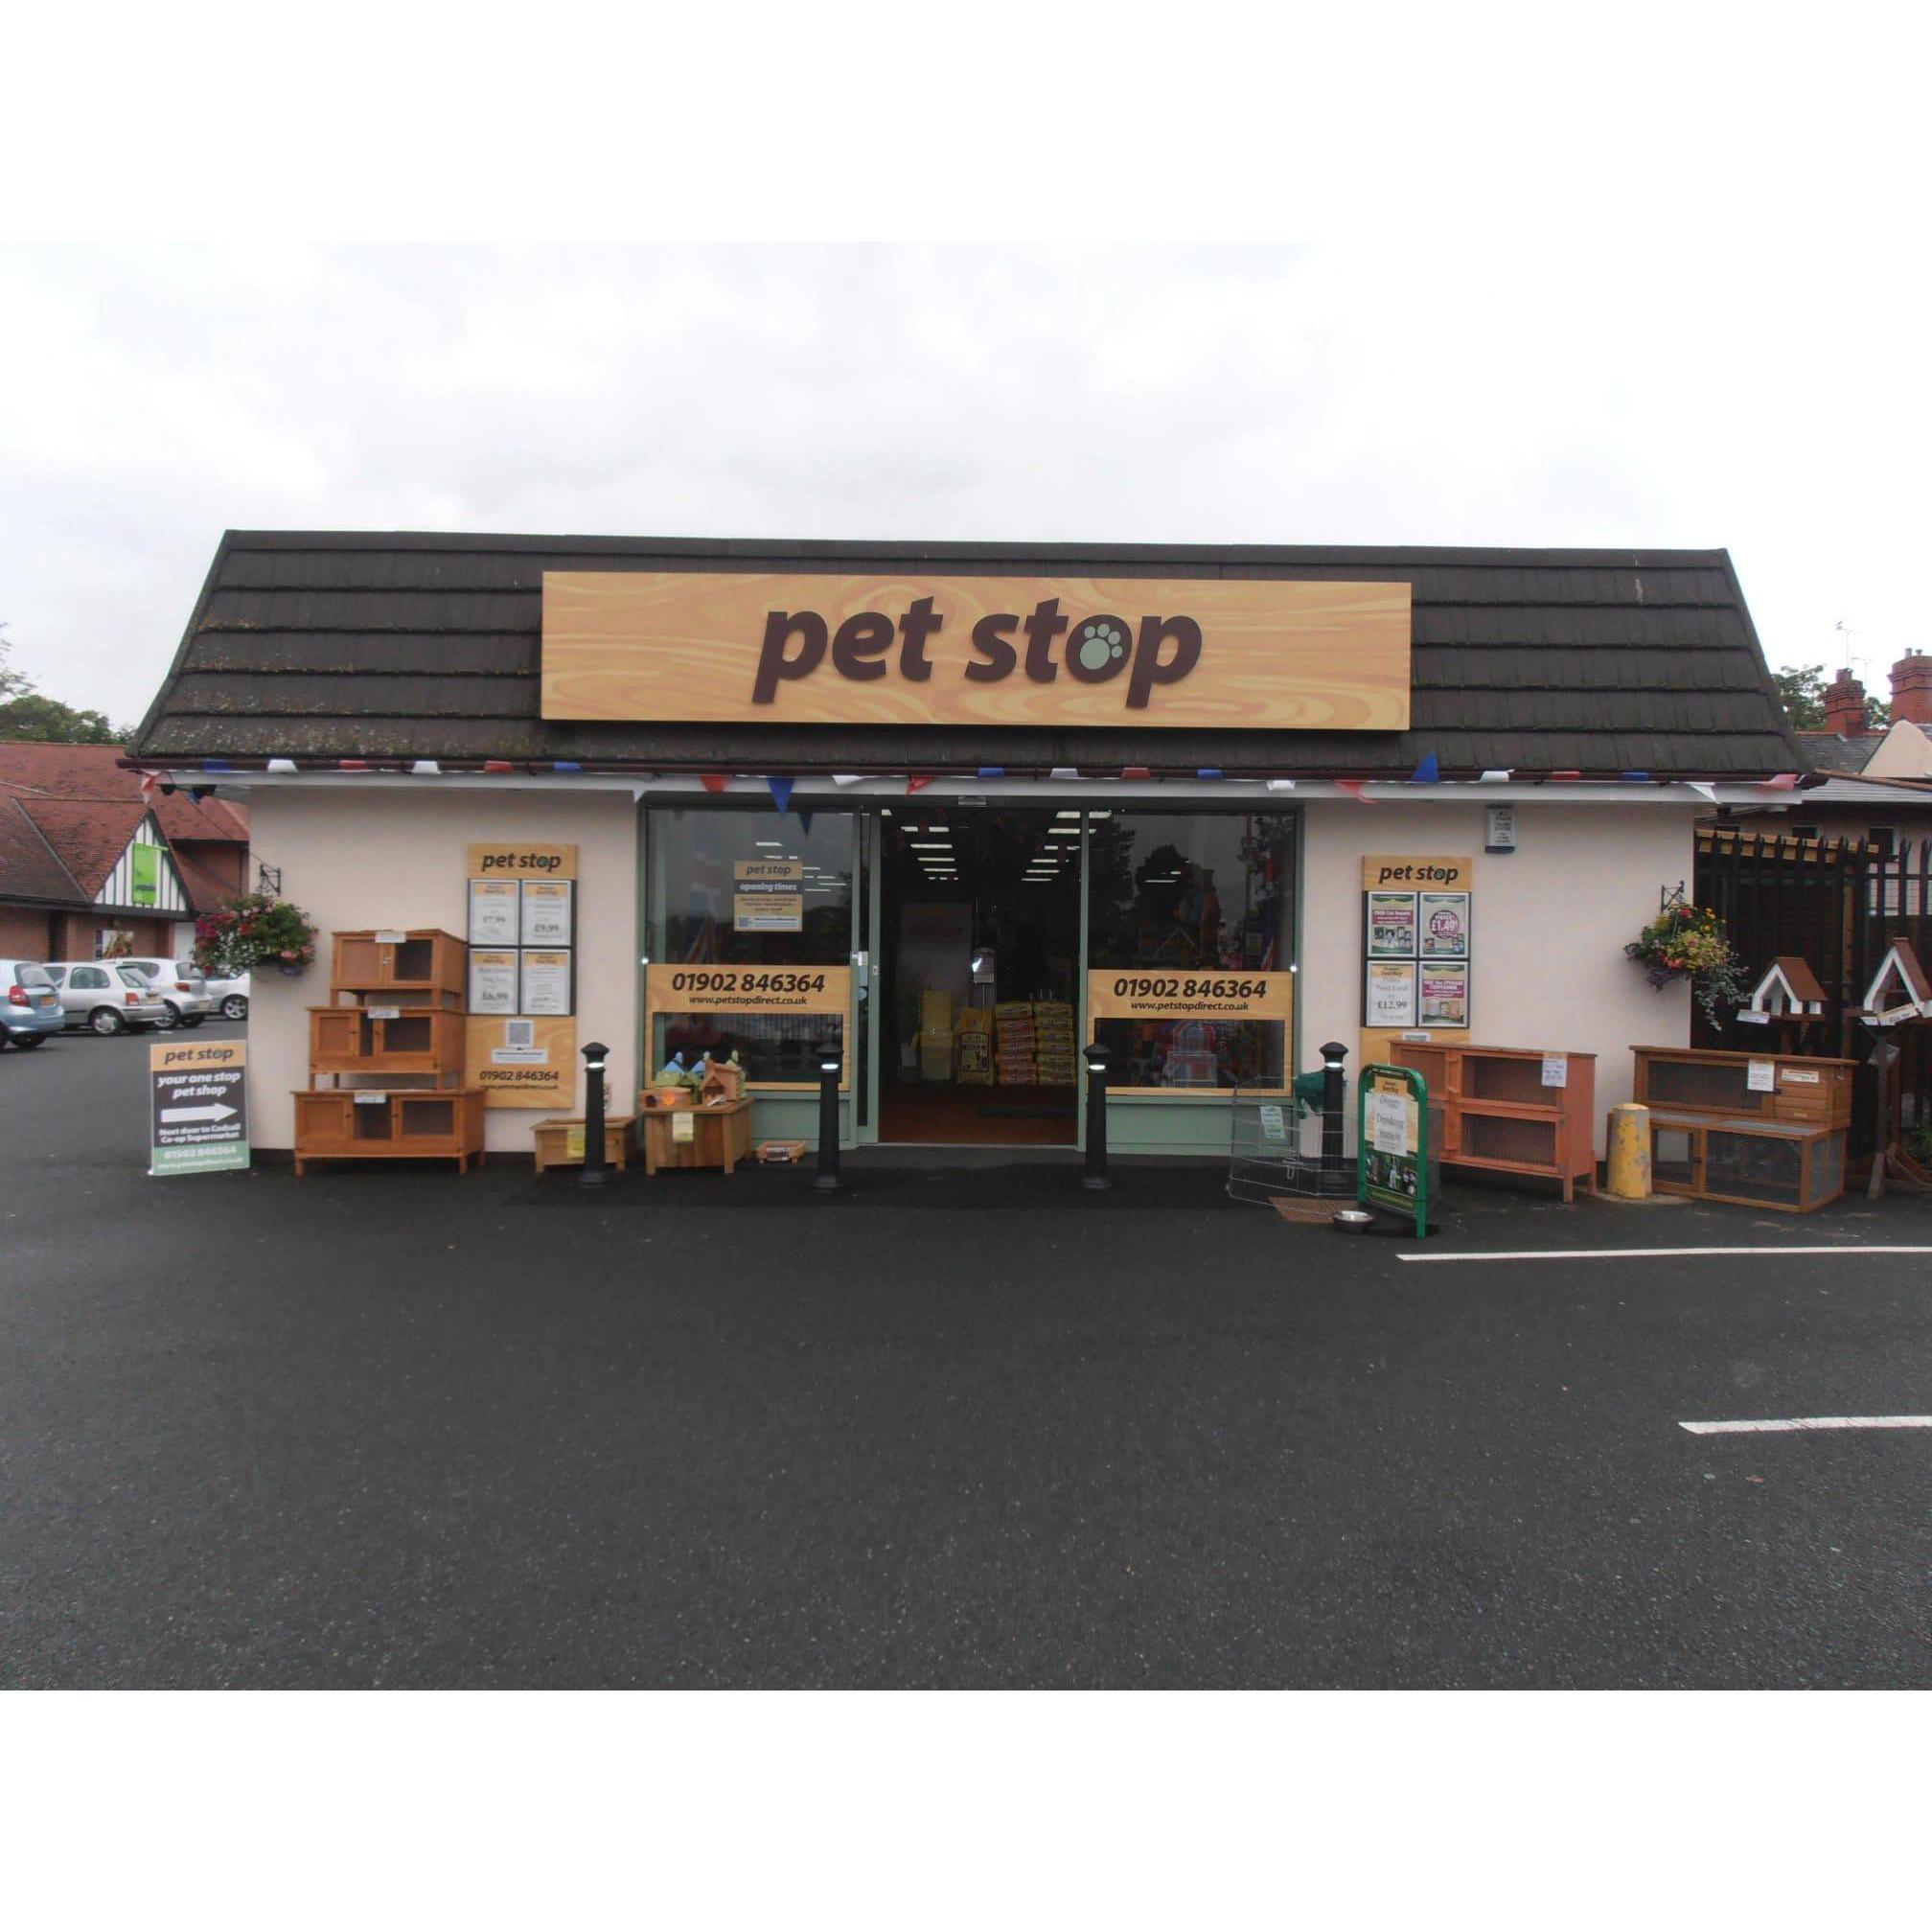 Pet Stop - Wolverhampton, Staffordshire WV8 1DB - 01902 846364   ShowMeLocal.com